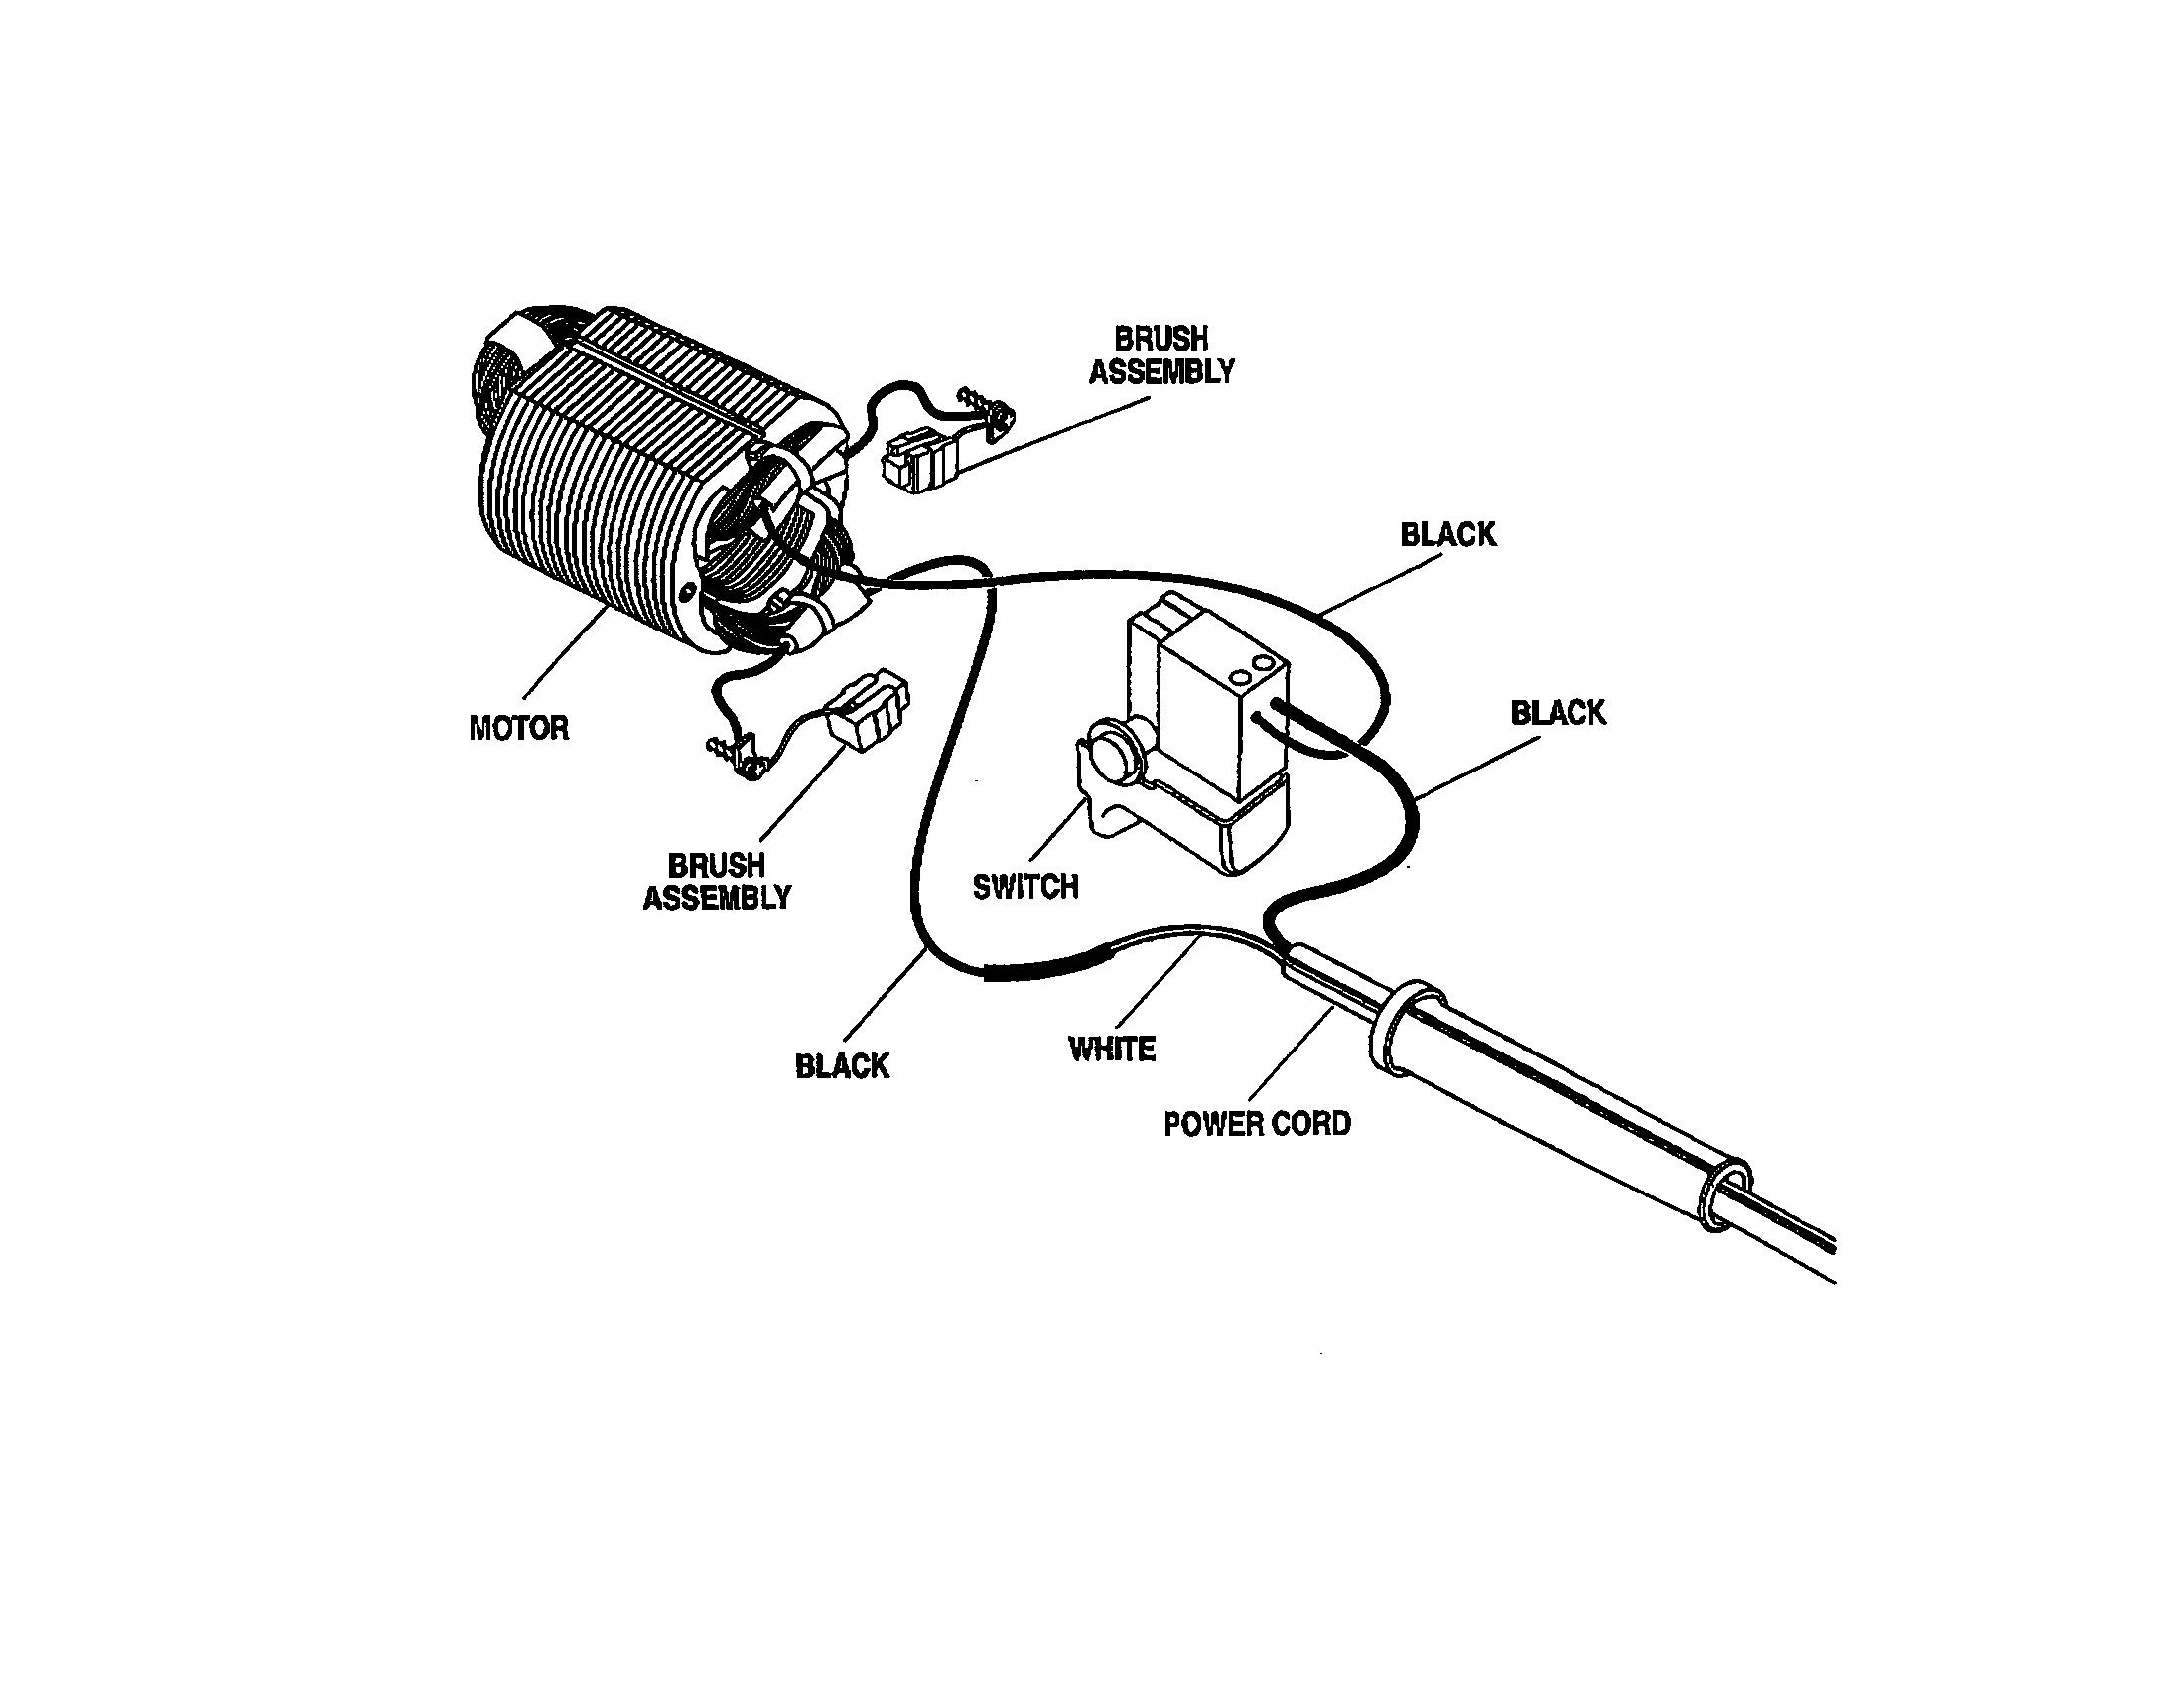 grinder wiring diagram [ 2200 x 1696 Pixel ]